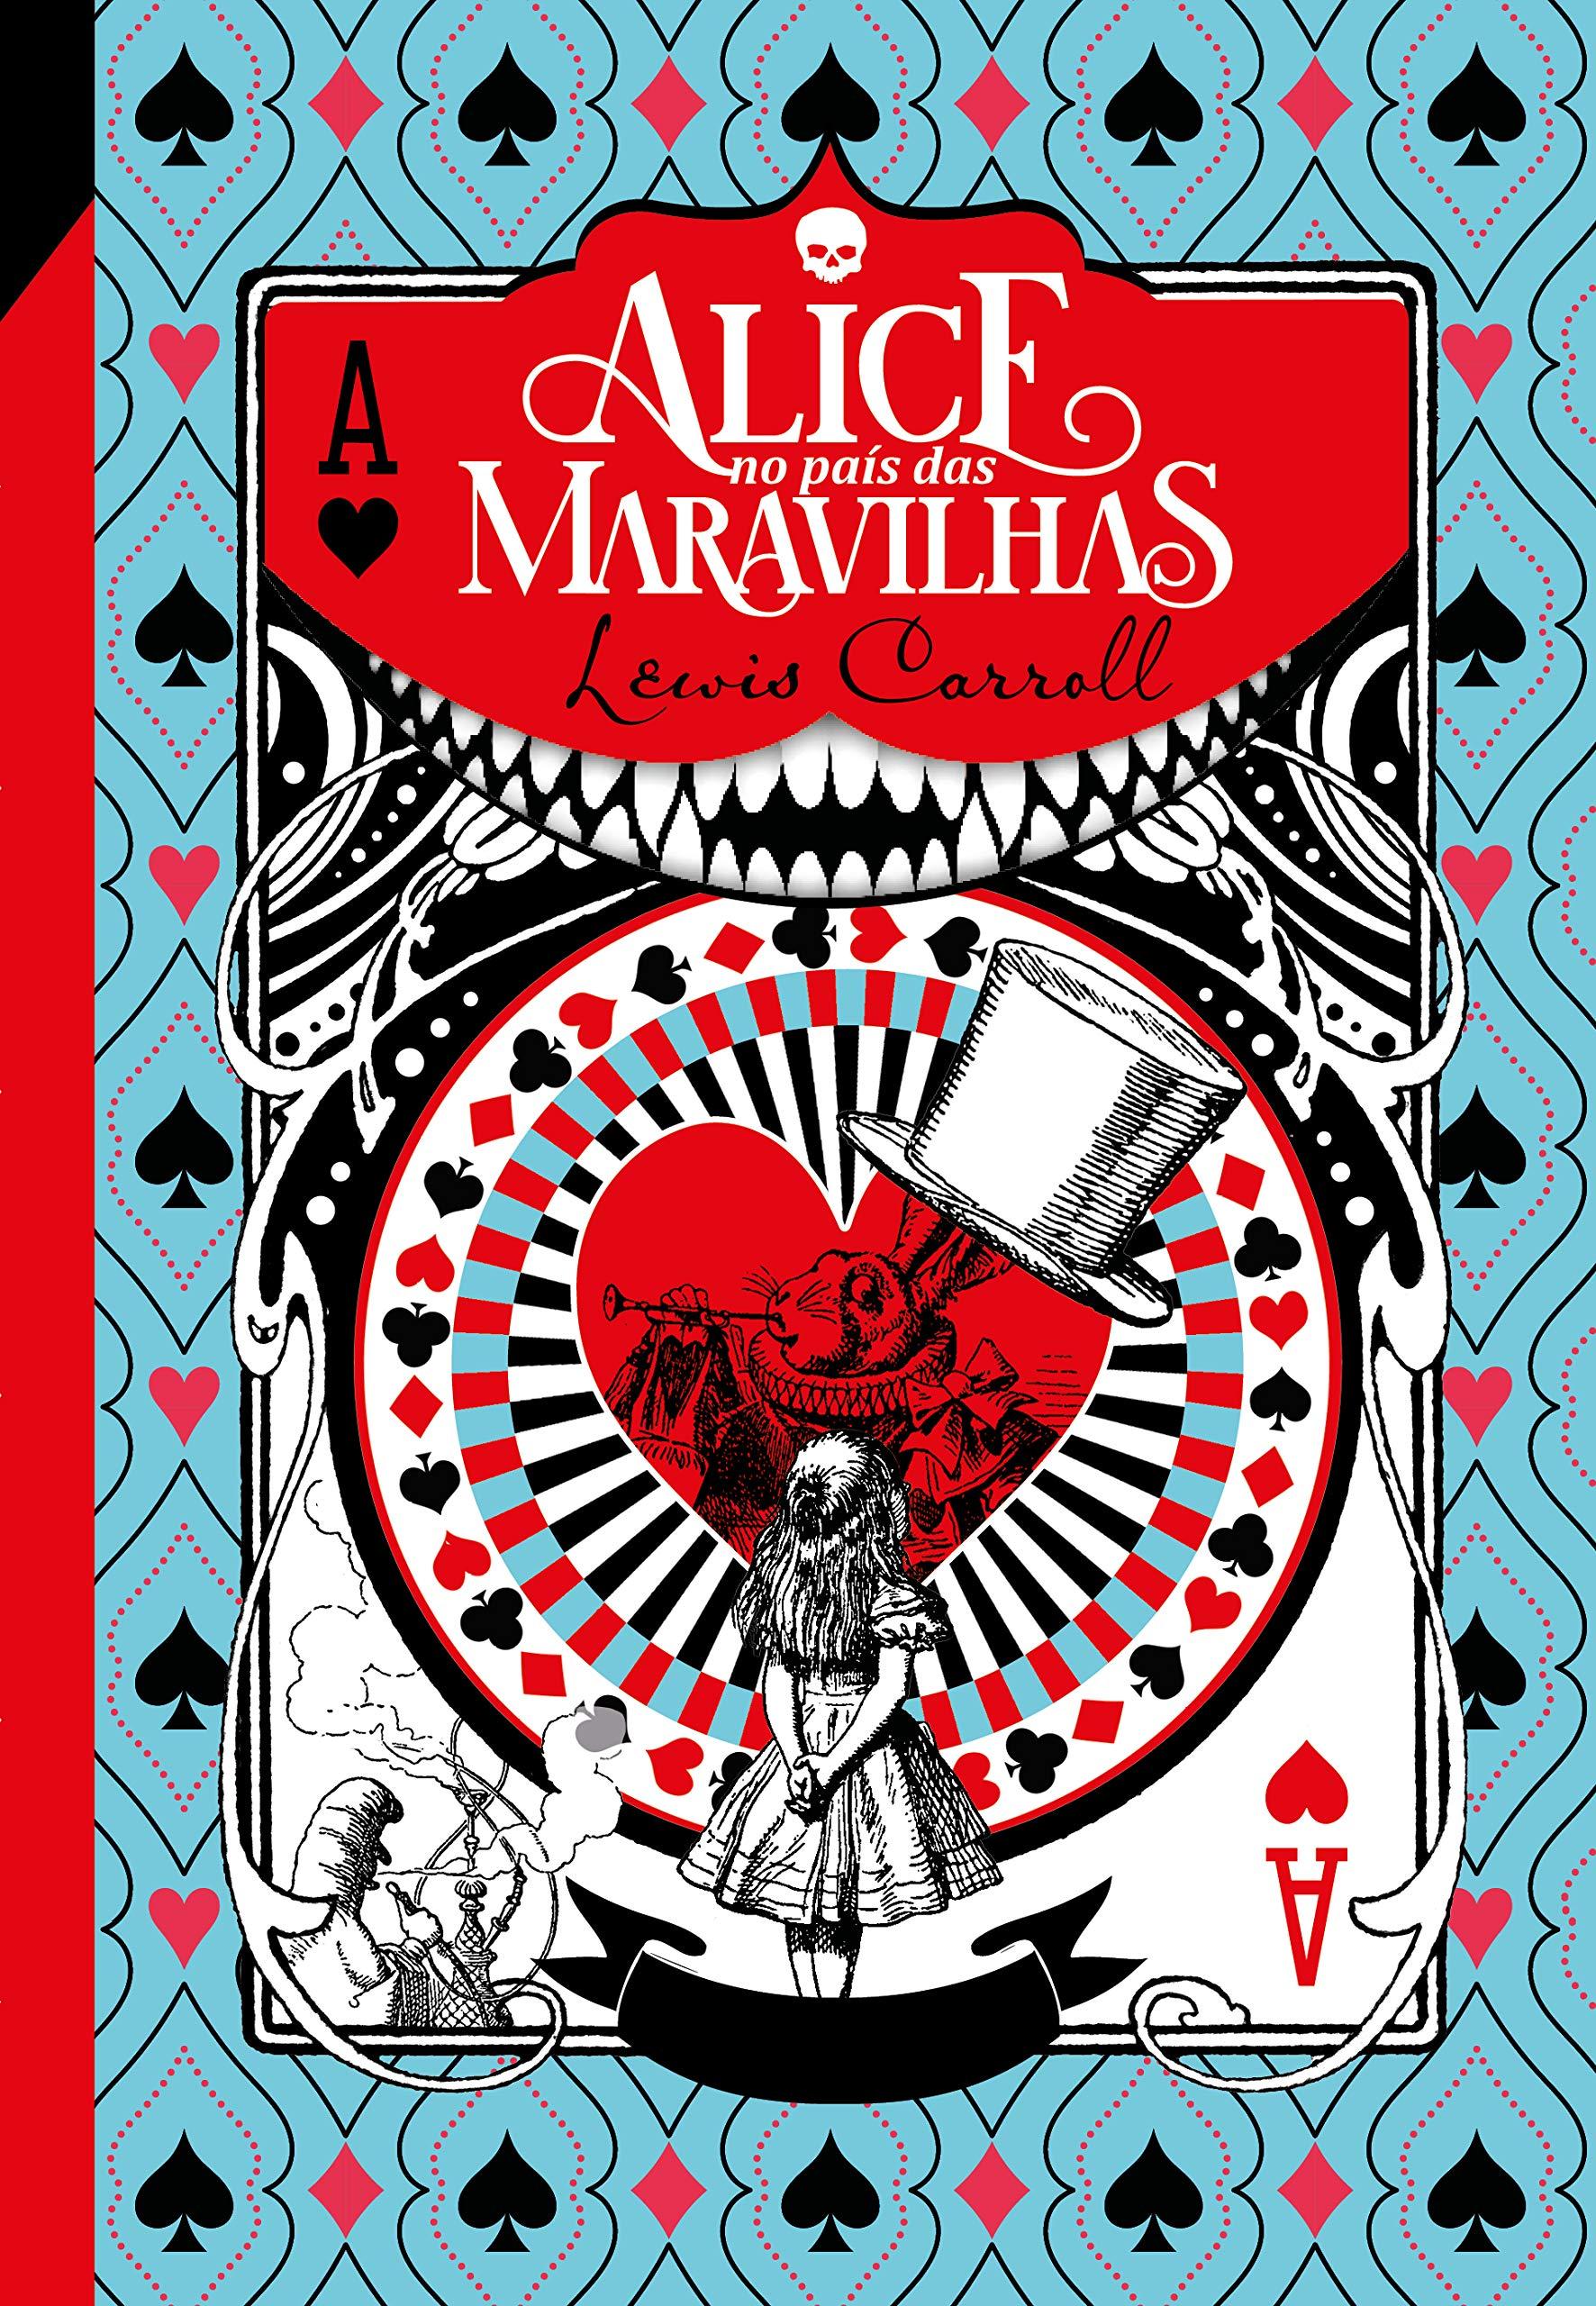 Alice no País das Maravilhas (Classic Edition) | Amazon.com.br